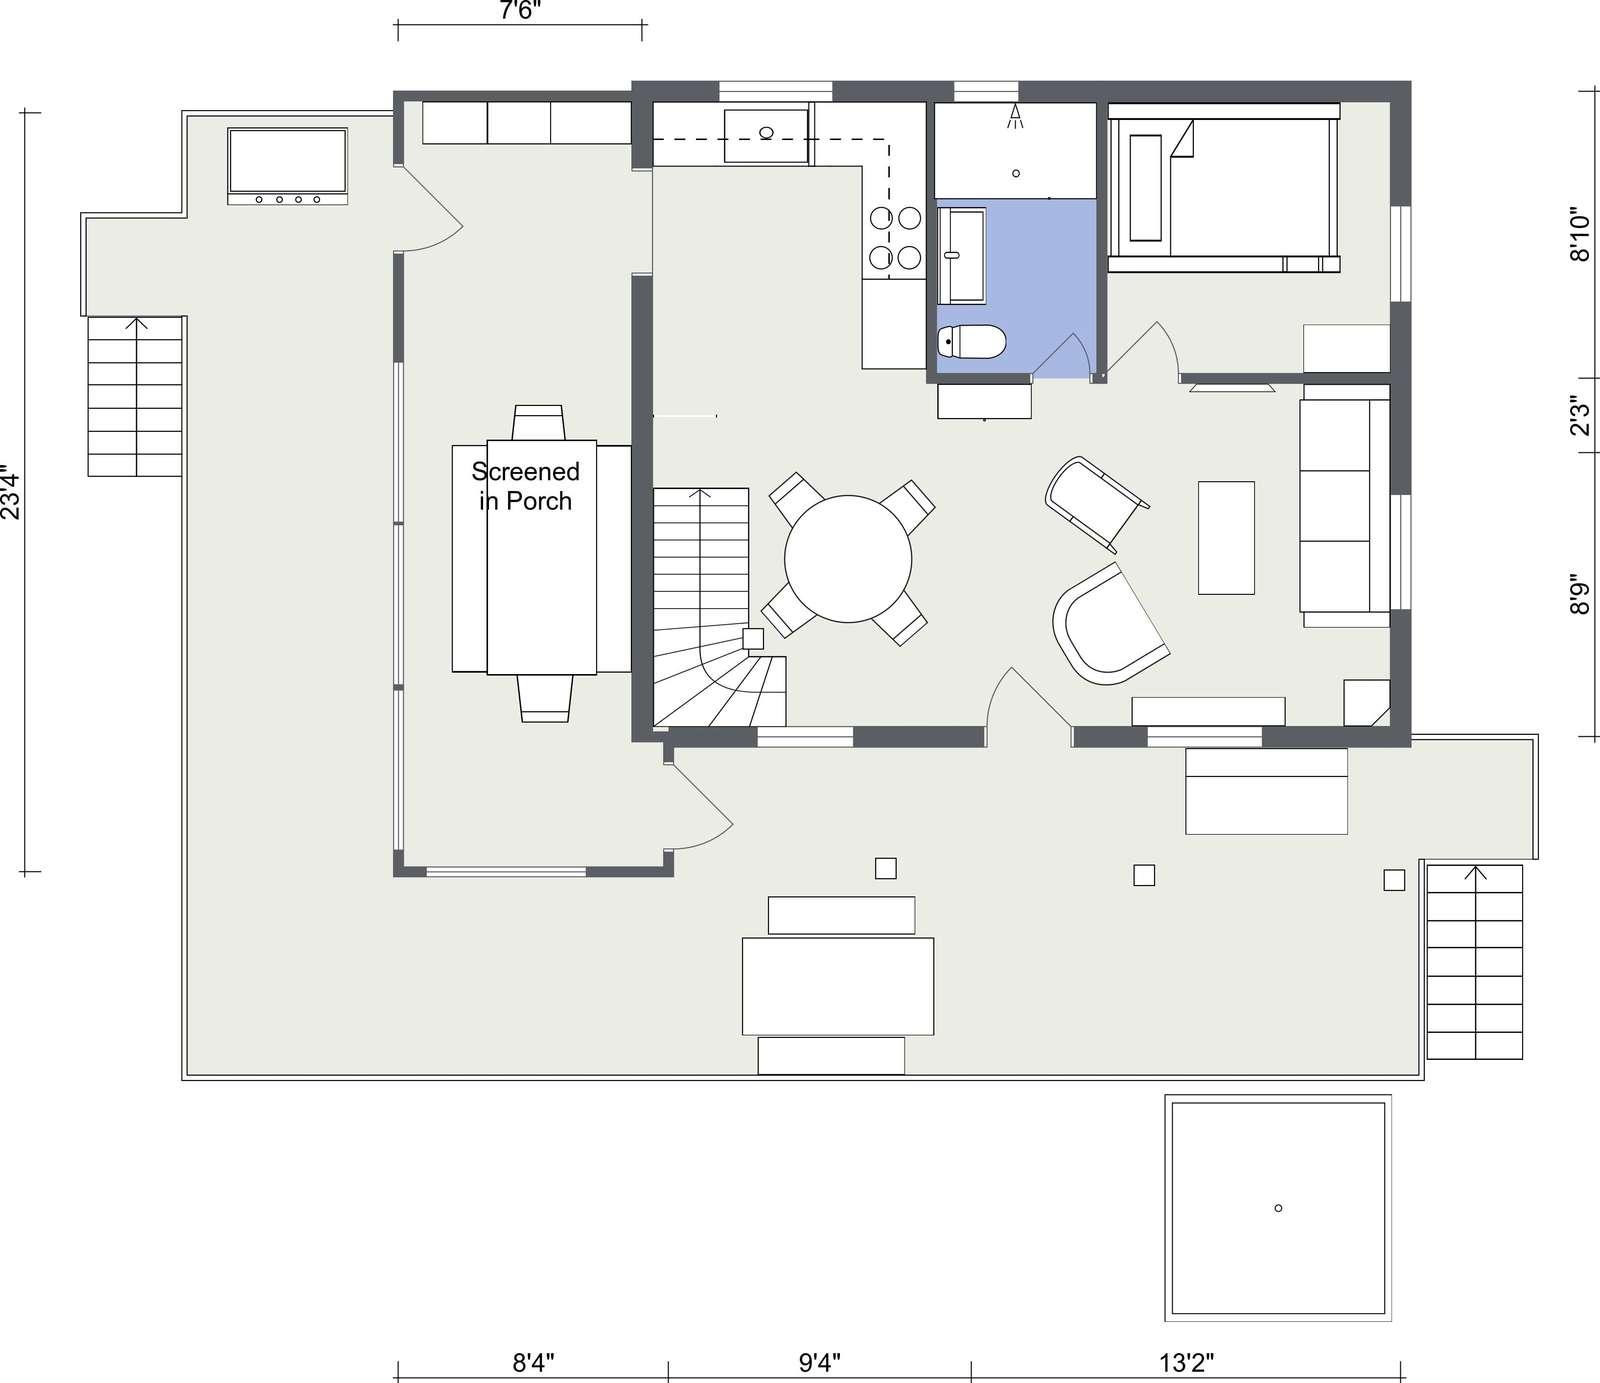 Main level floor plan - 2D